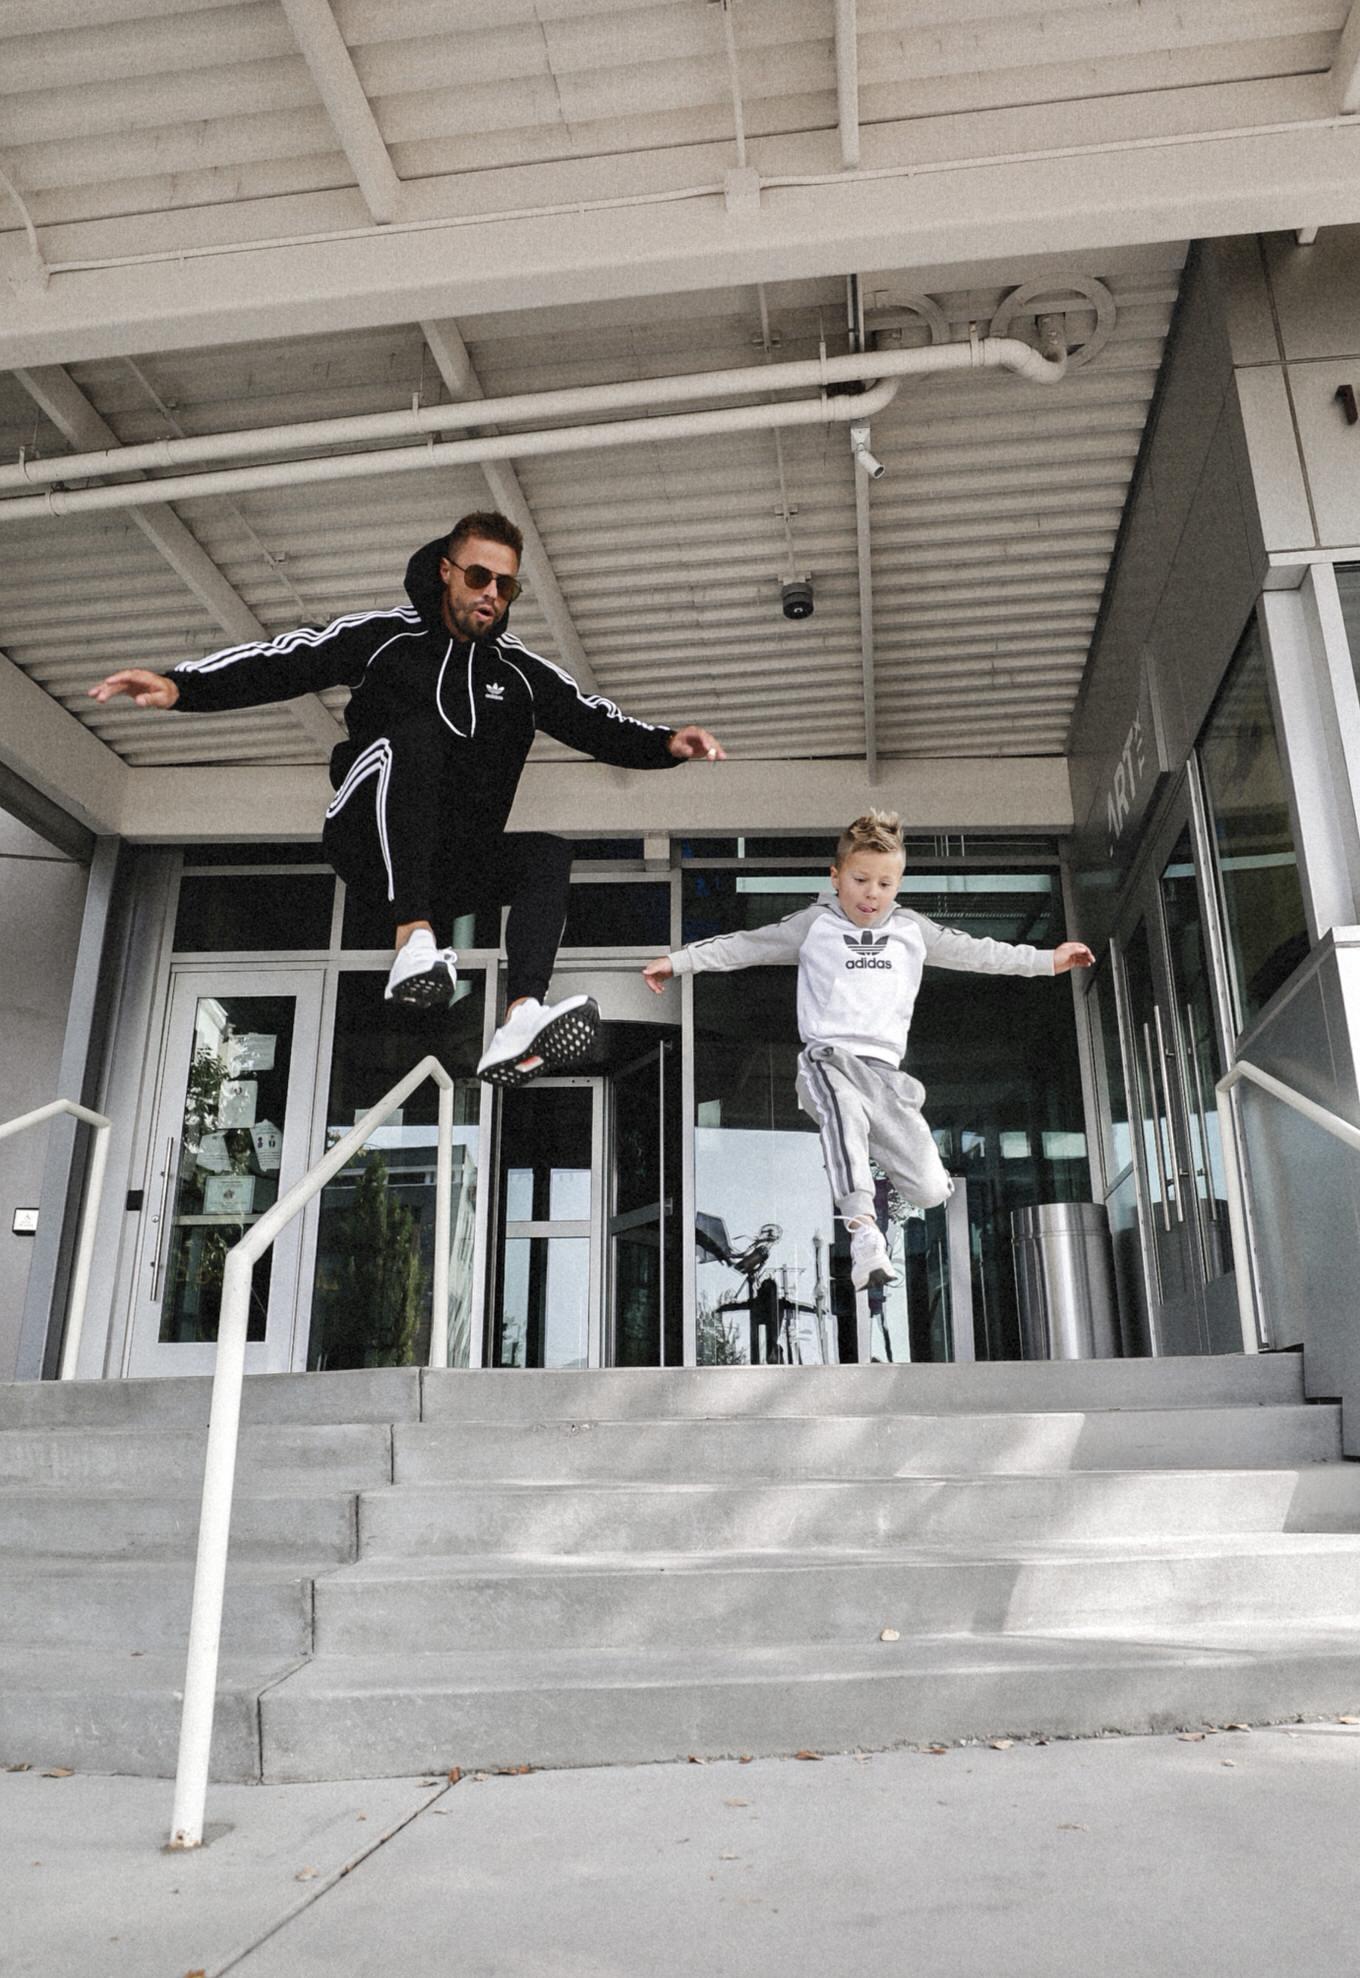 adidas workout sneaker